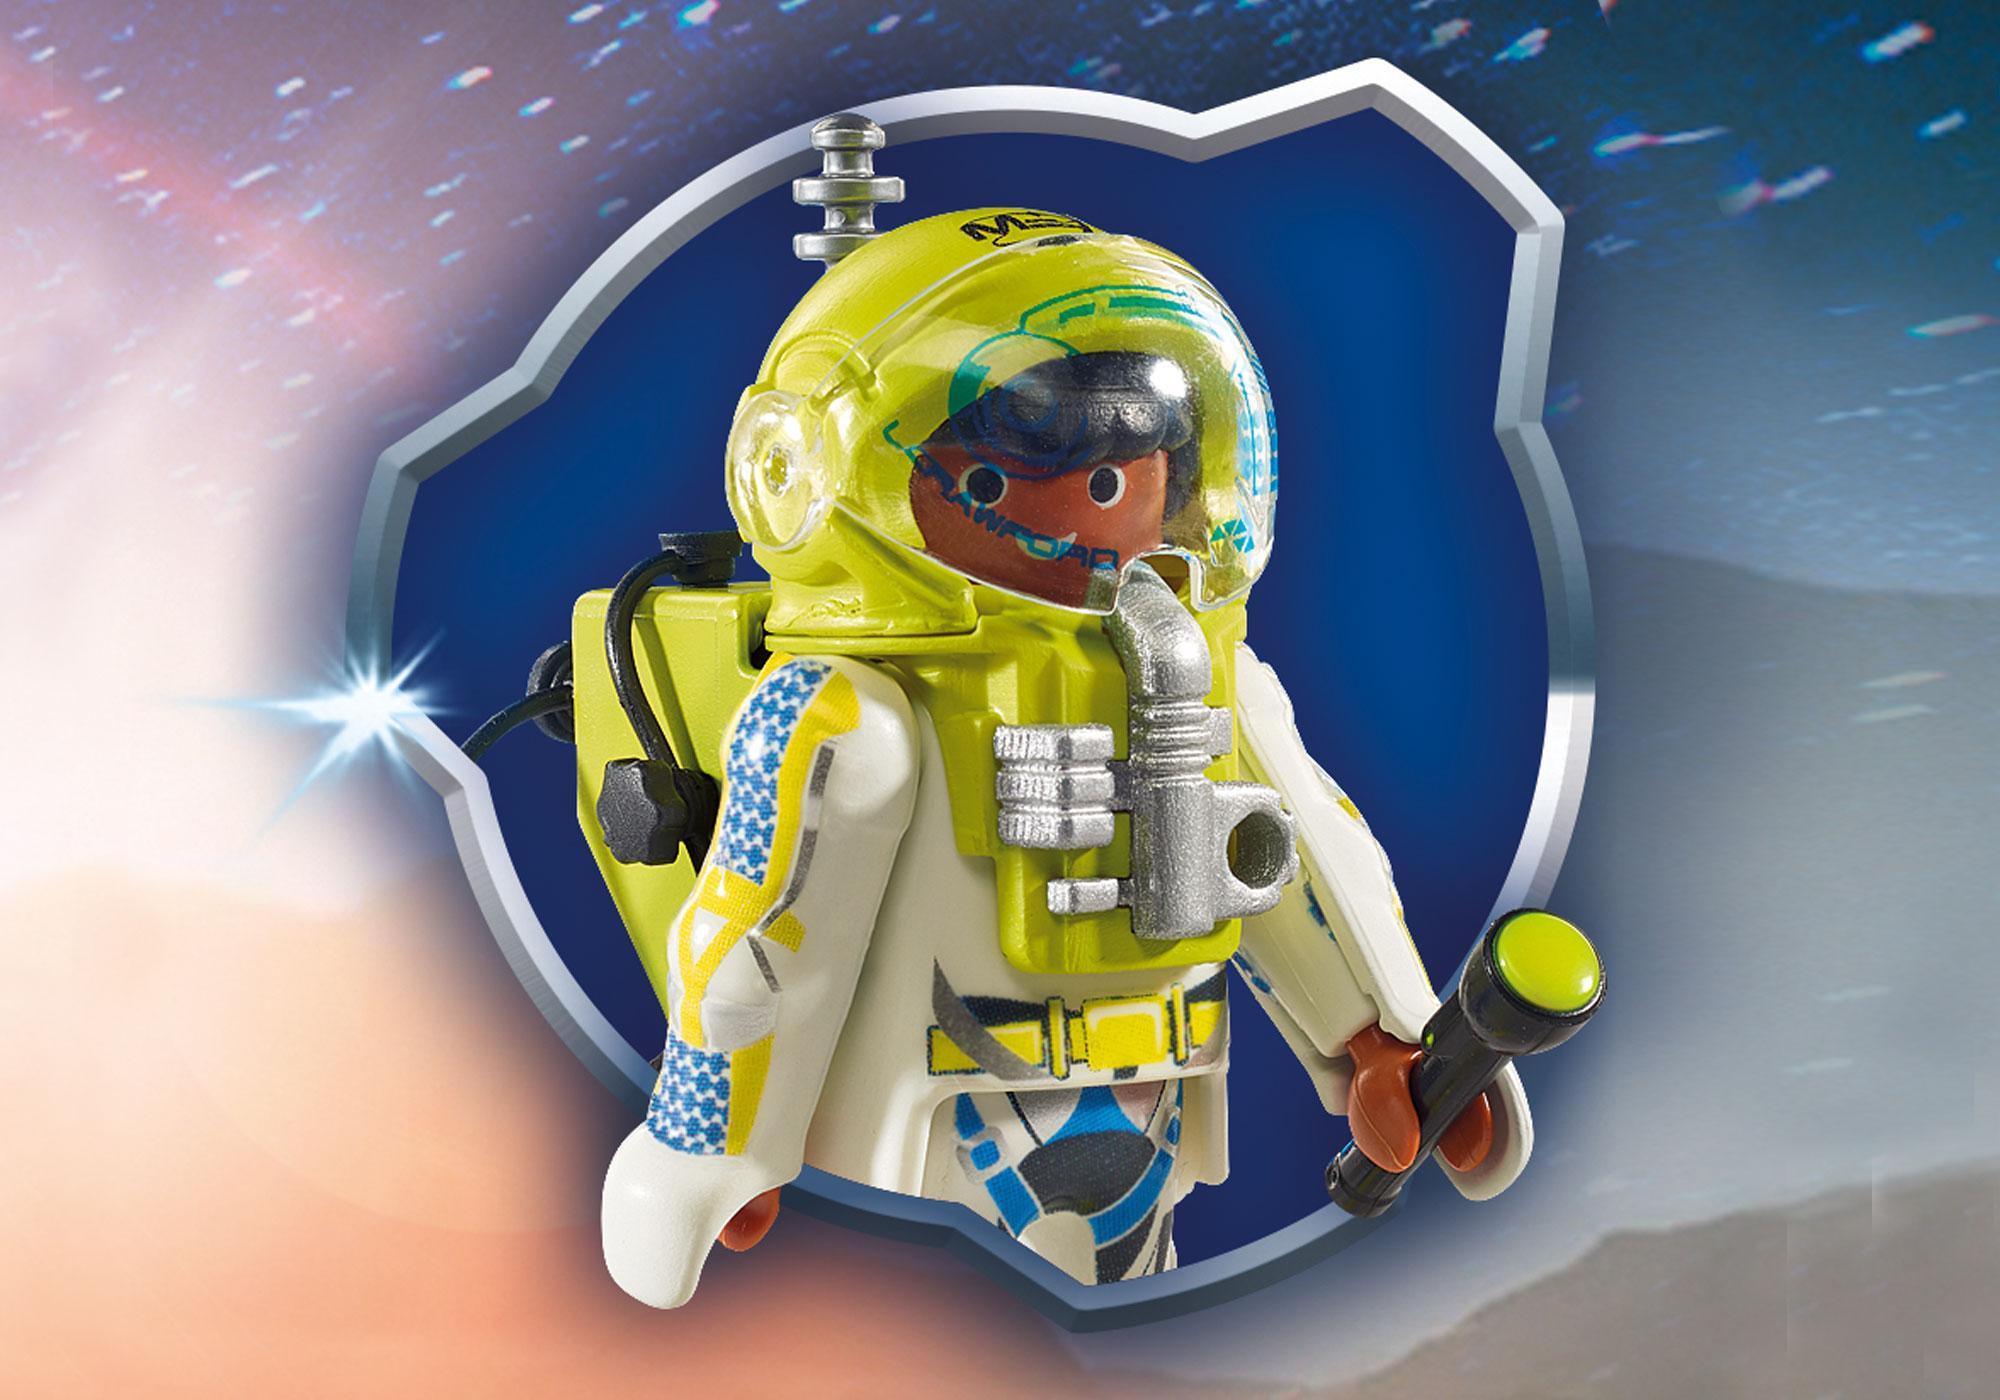 http://media.playmobil.com/i/playmobil/9487_product_extra4/Διαστημικός Σταθμός στον Άρη